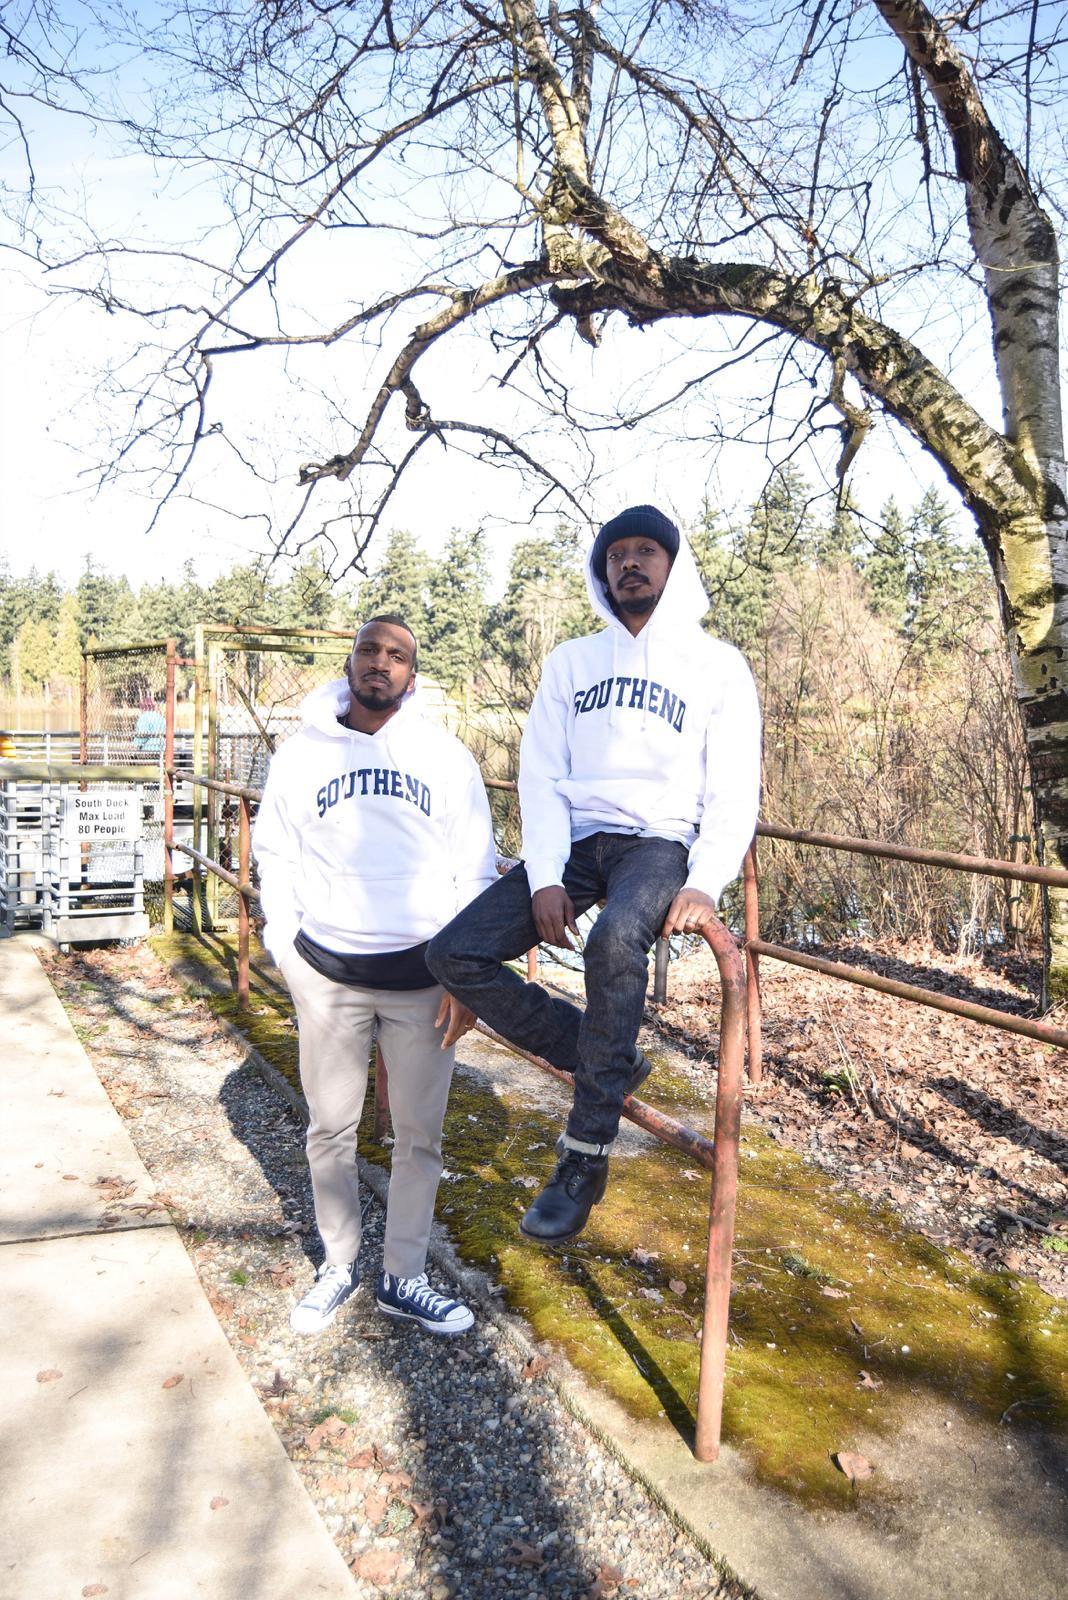 Perris Wright & Umi Wagoner, co-founders of eTc Tacoma